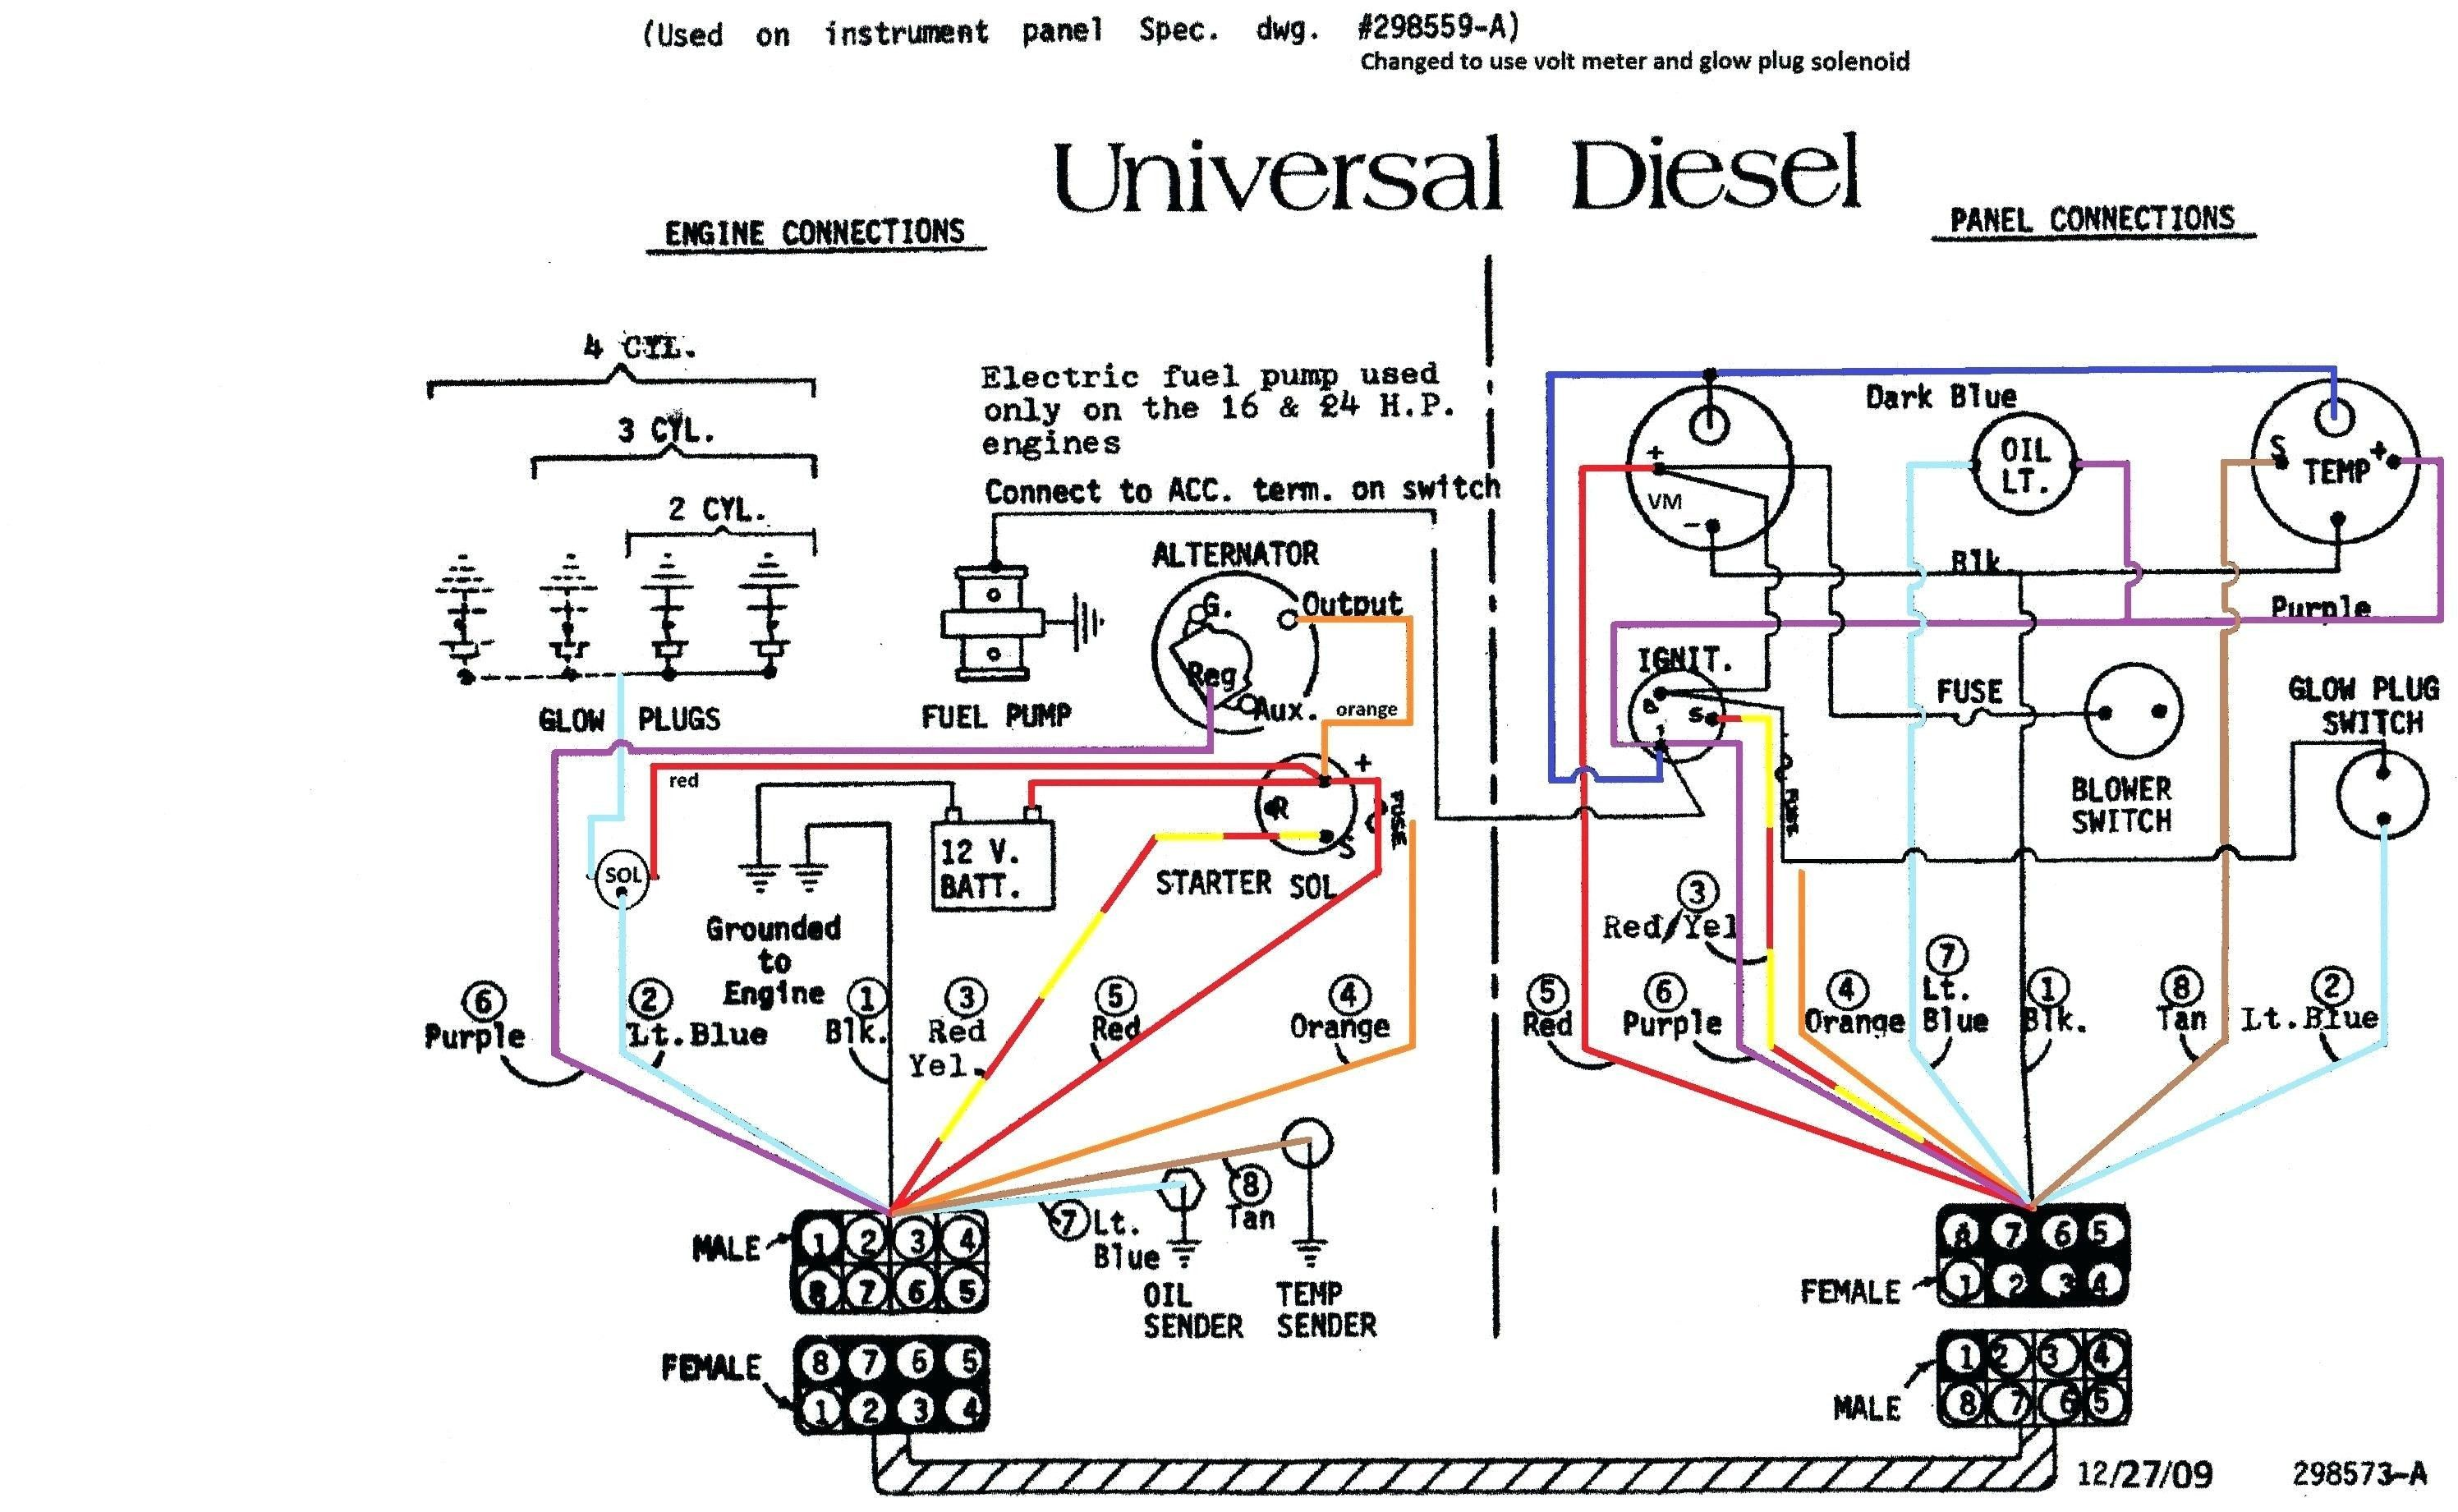 medium resolution of powerline alternator wiring diagram wiring diagrams powerline alternator wiring diagram